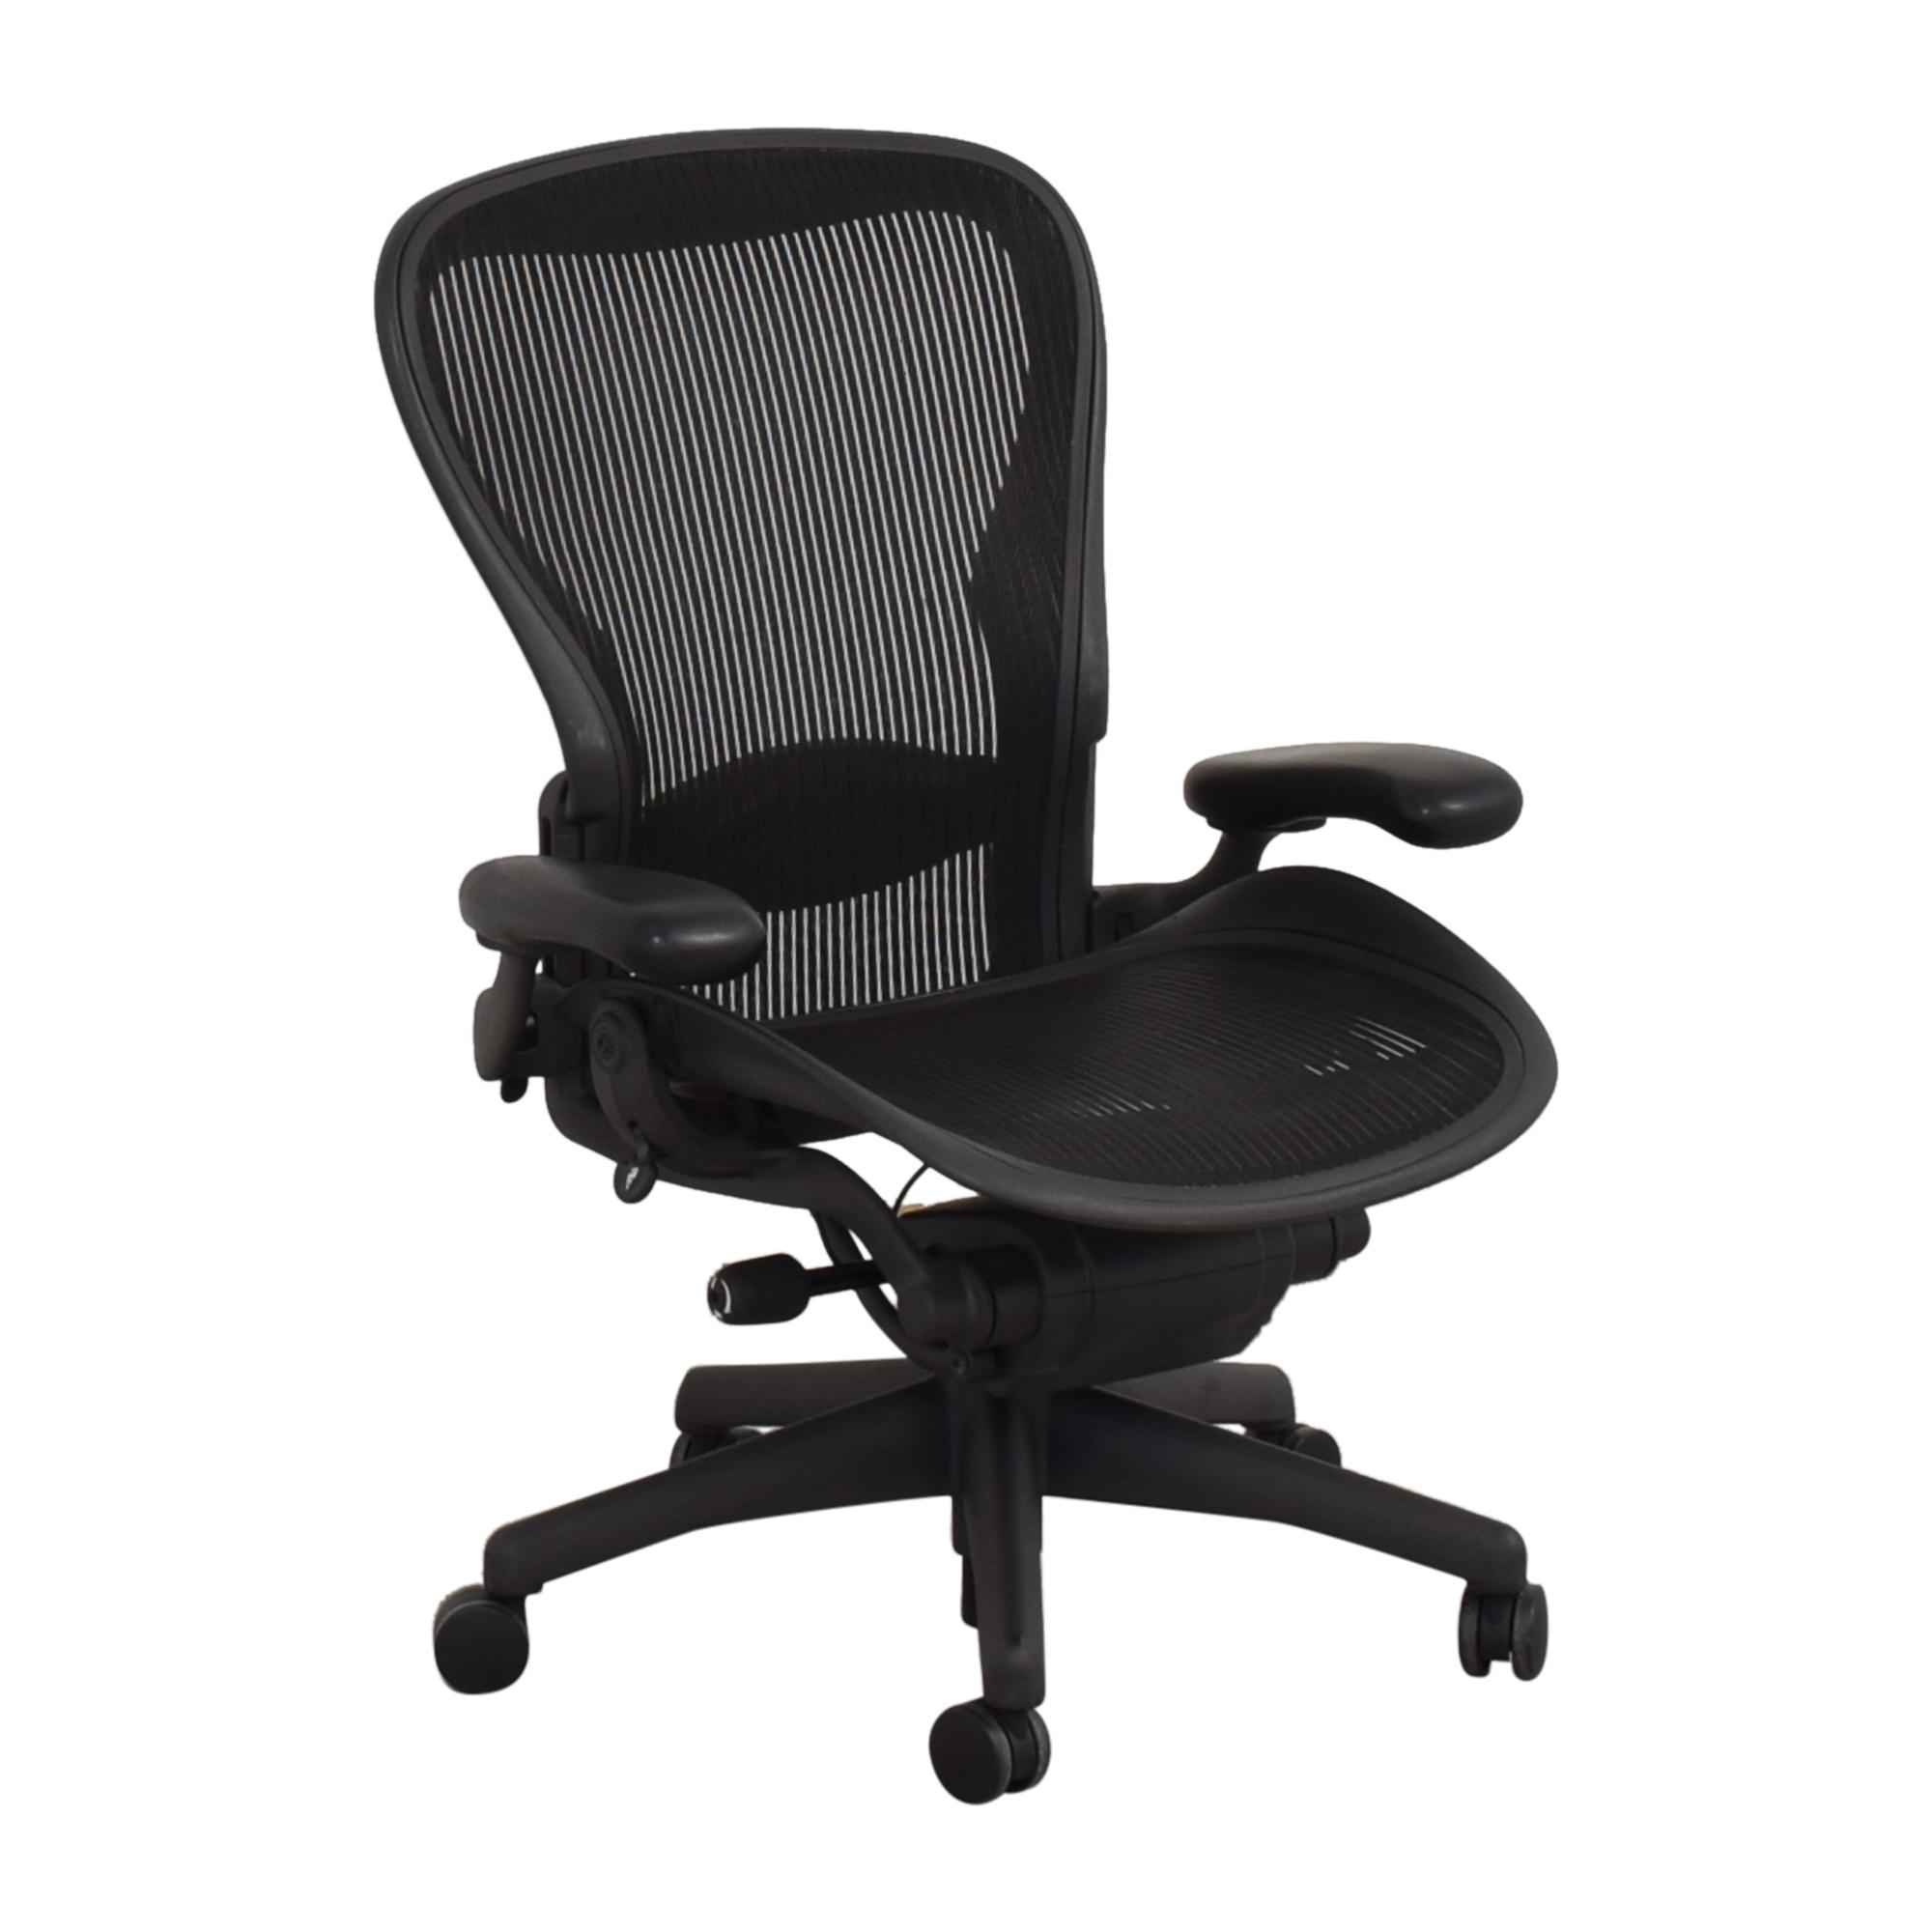 Herman Miller Size C Aeron Chair / Chairs